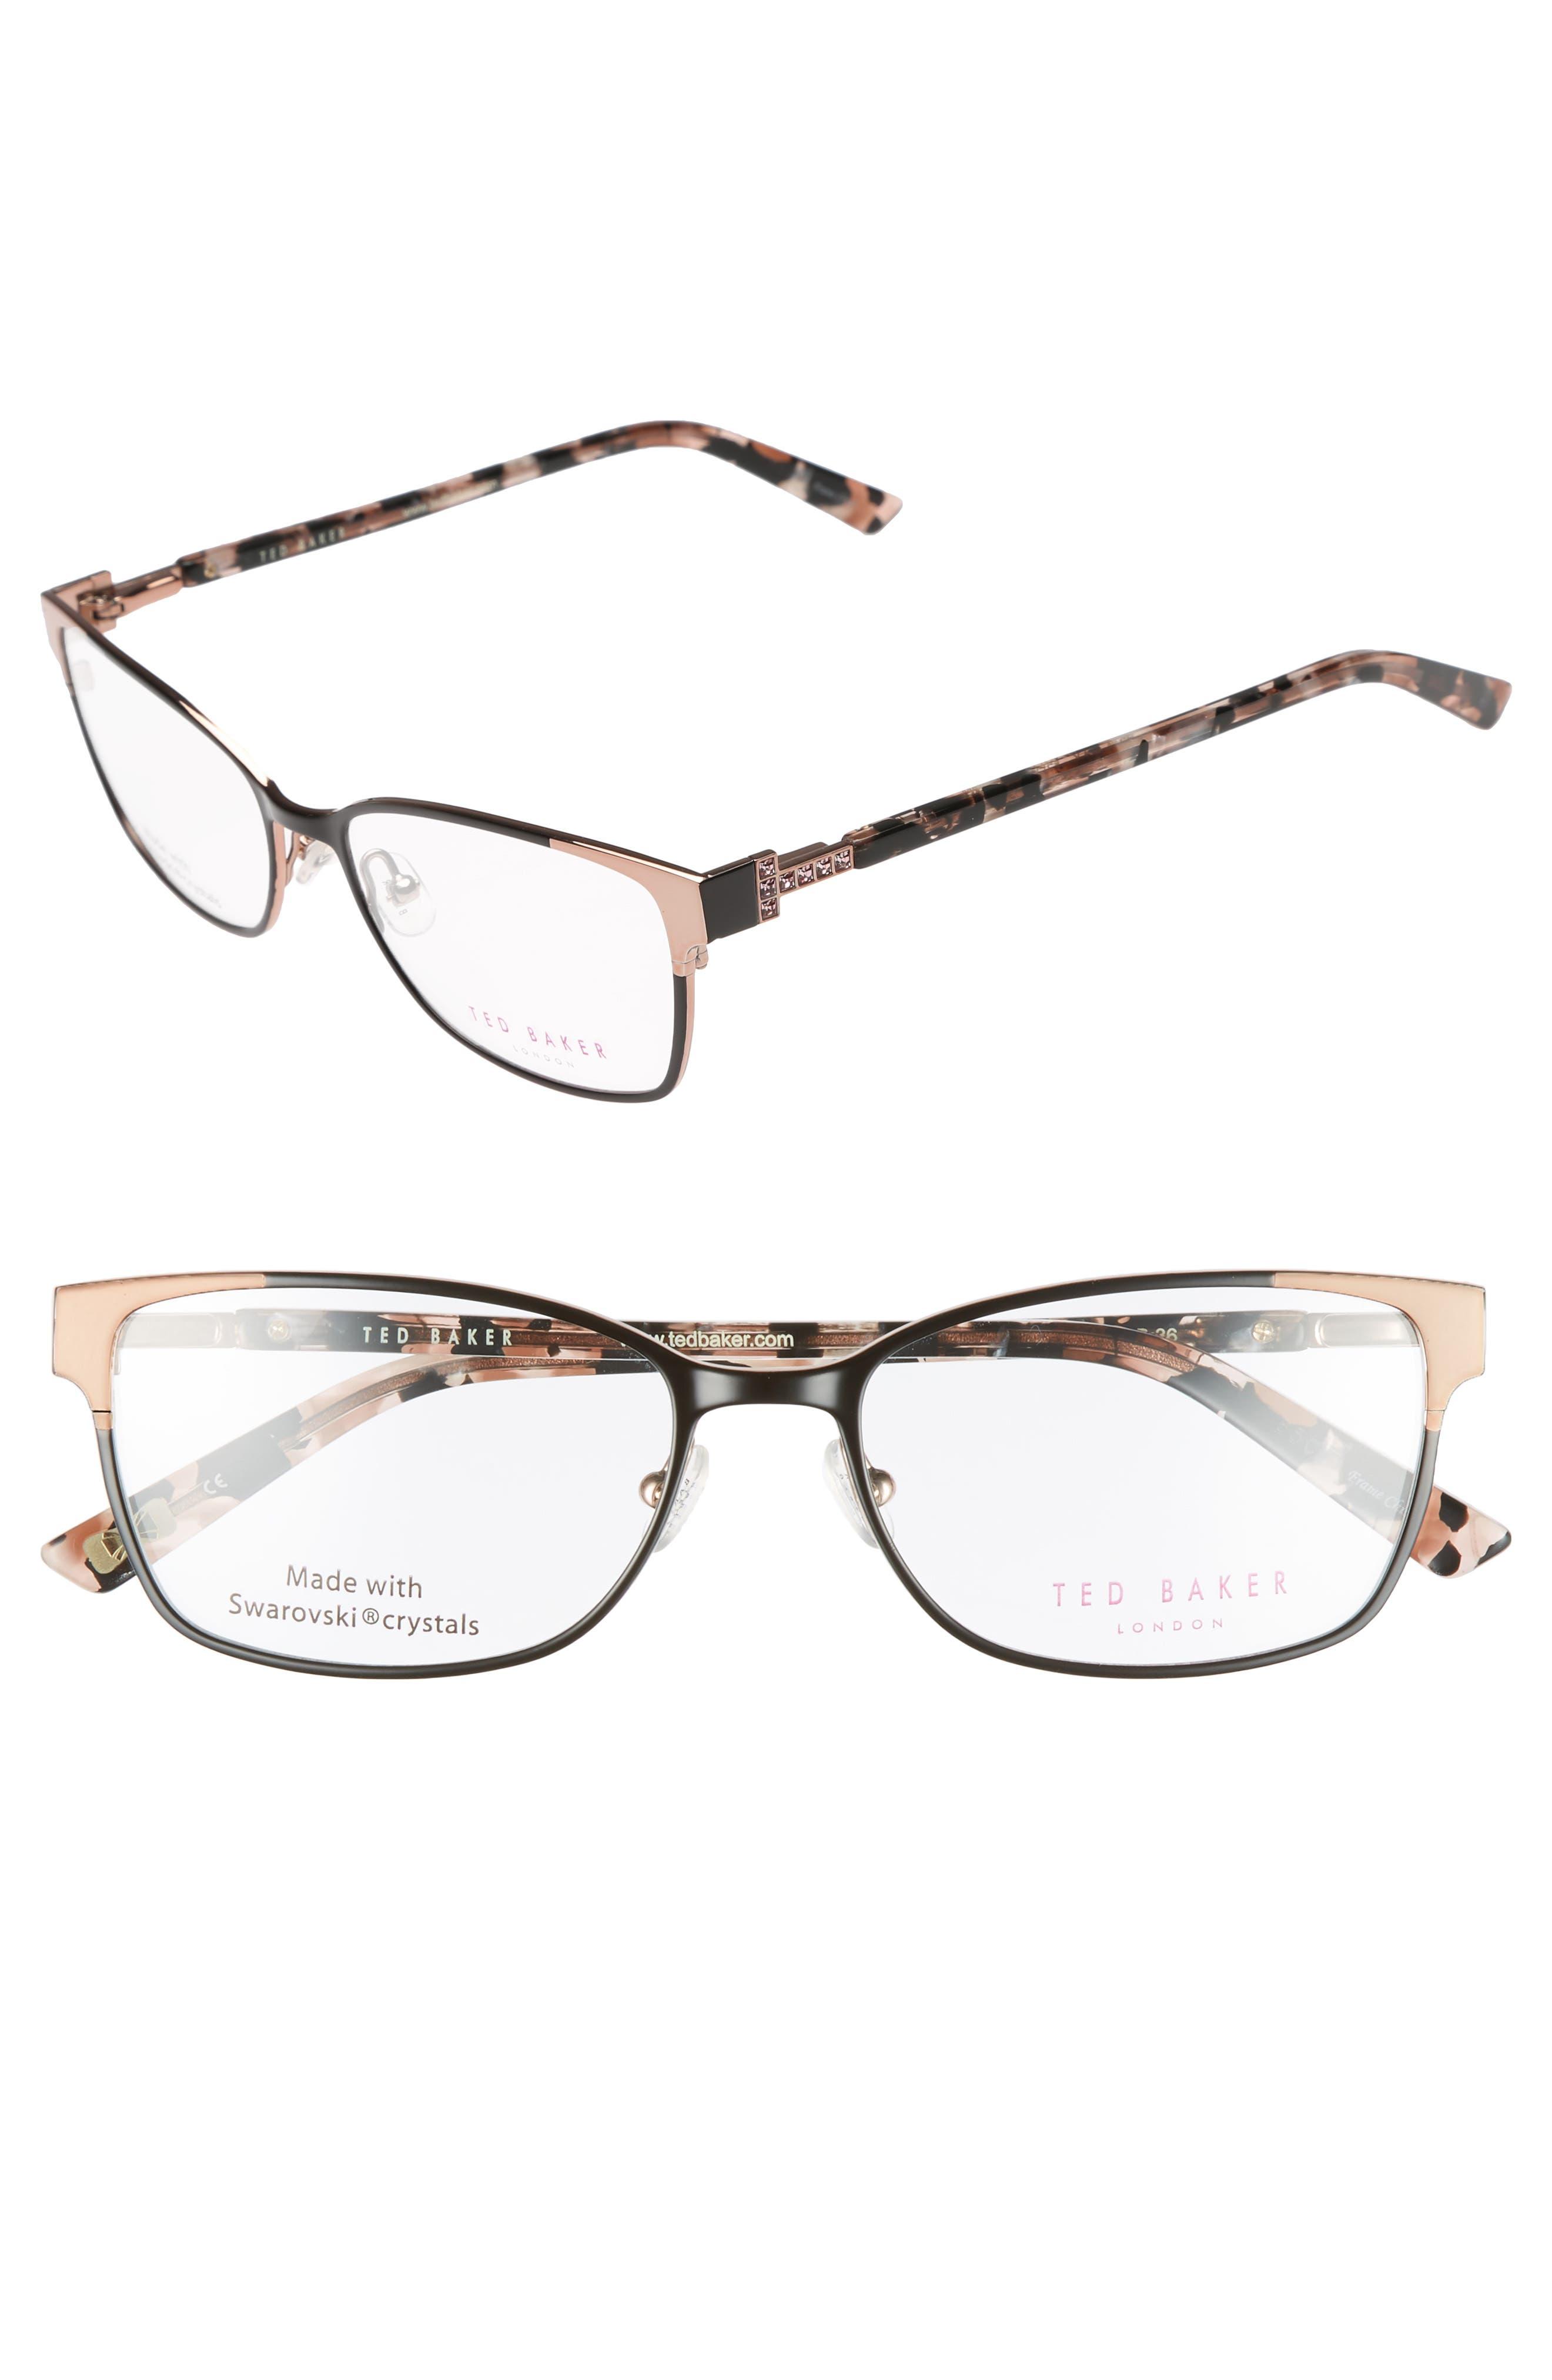 Main Image - Ted Baker London 52mm Crystal Rectangular Optical Glasses